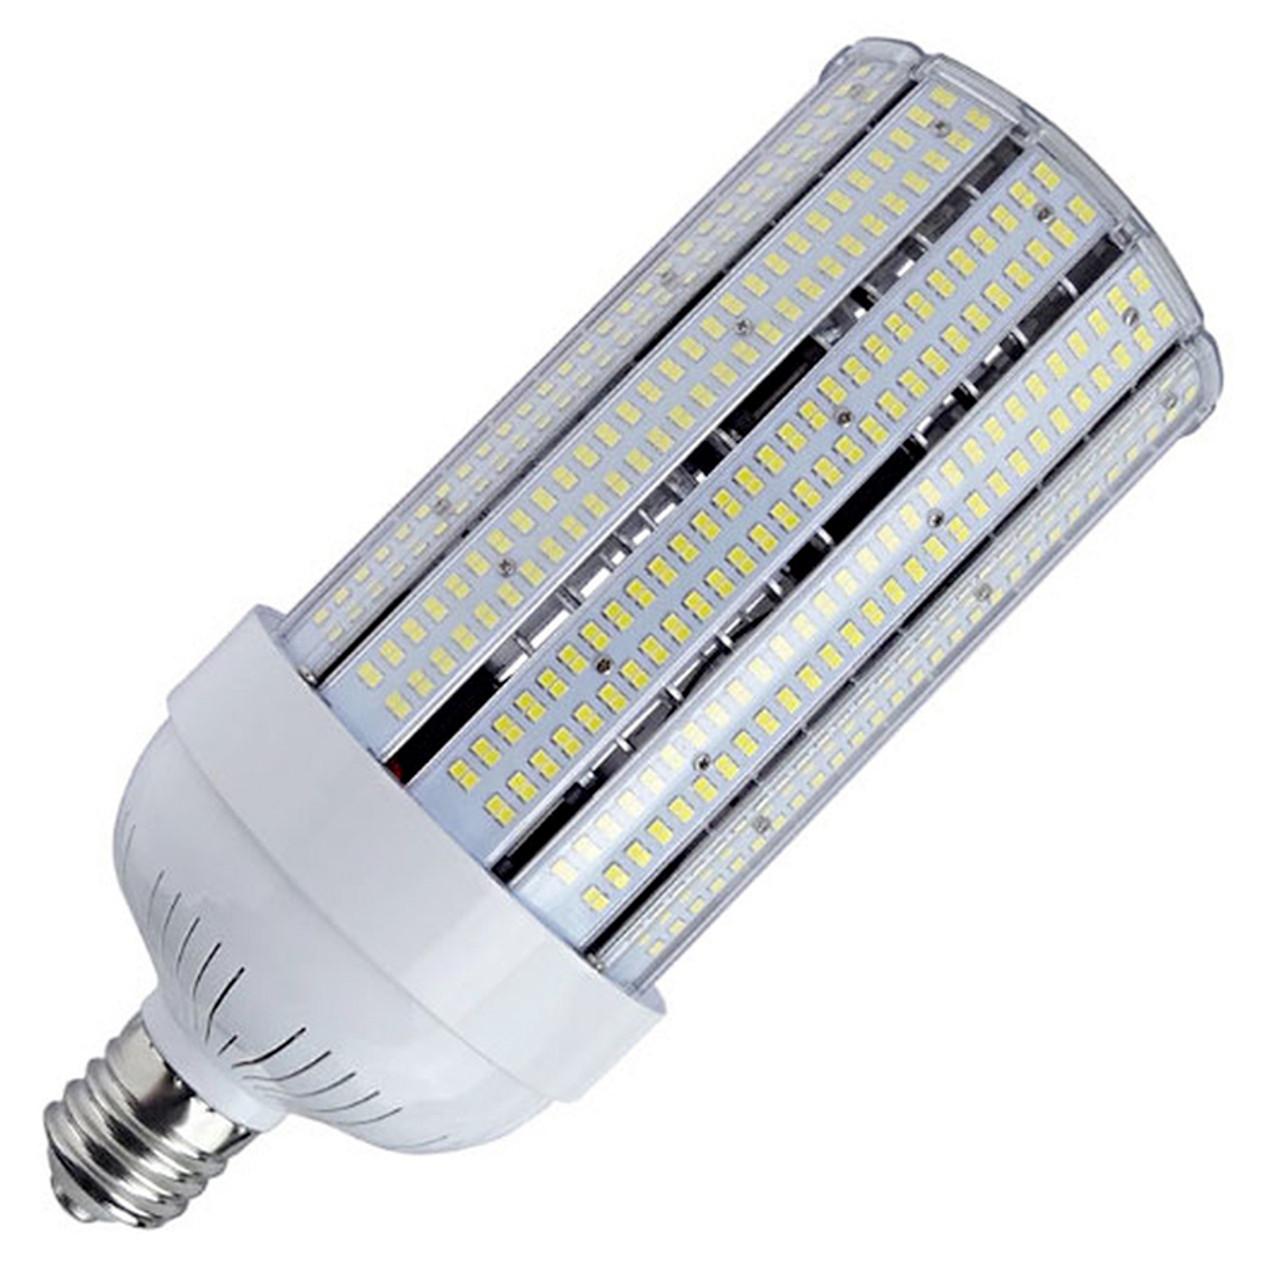 1000 watt metal halide ballast wiring diagram 200 watt led corn bulb will replace your 1000 watt hids  200 watt led corn bulb will replace